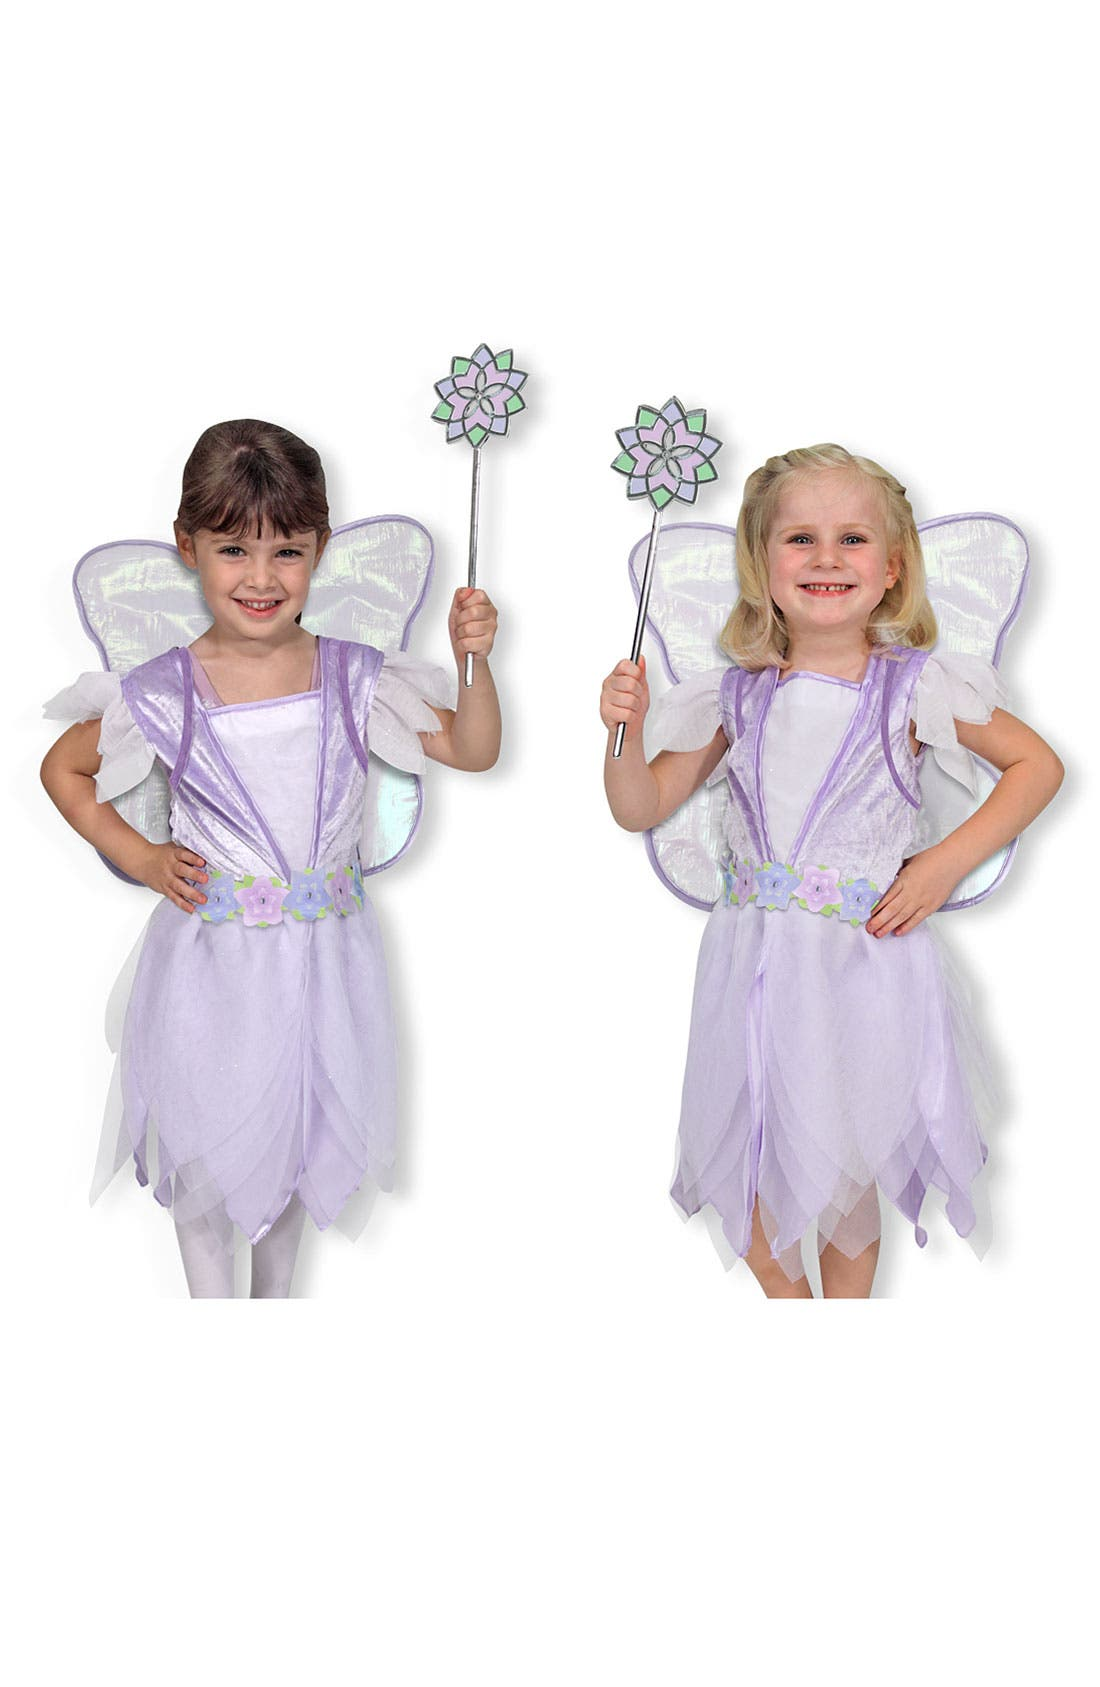 Alternate Image 1 Selected - Melissa & Doug 'Fairy' Costume (Toddler)